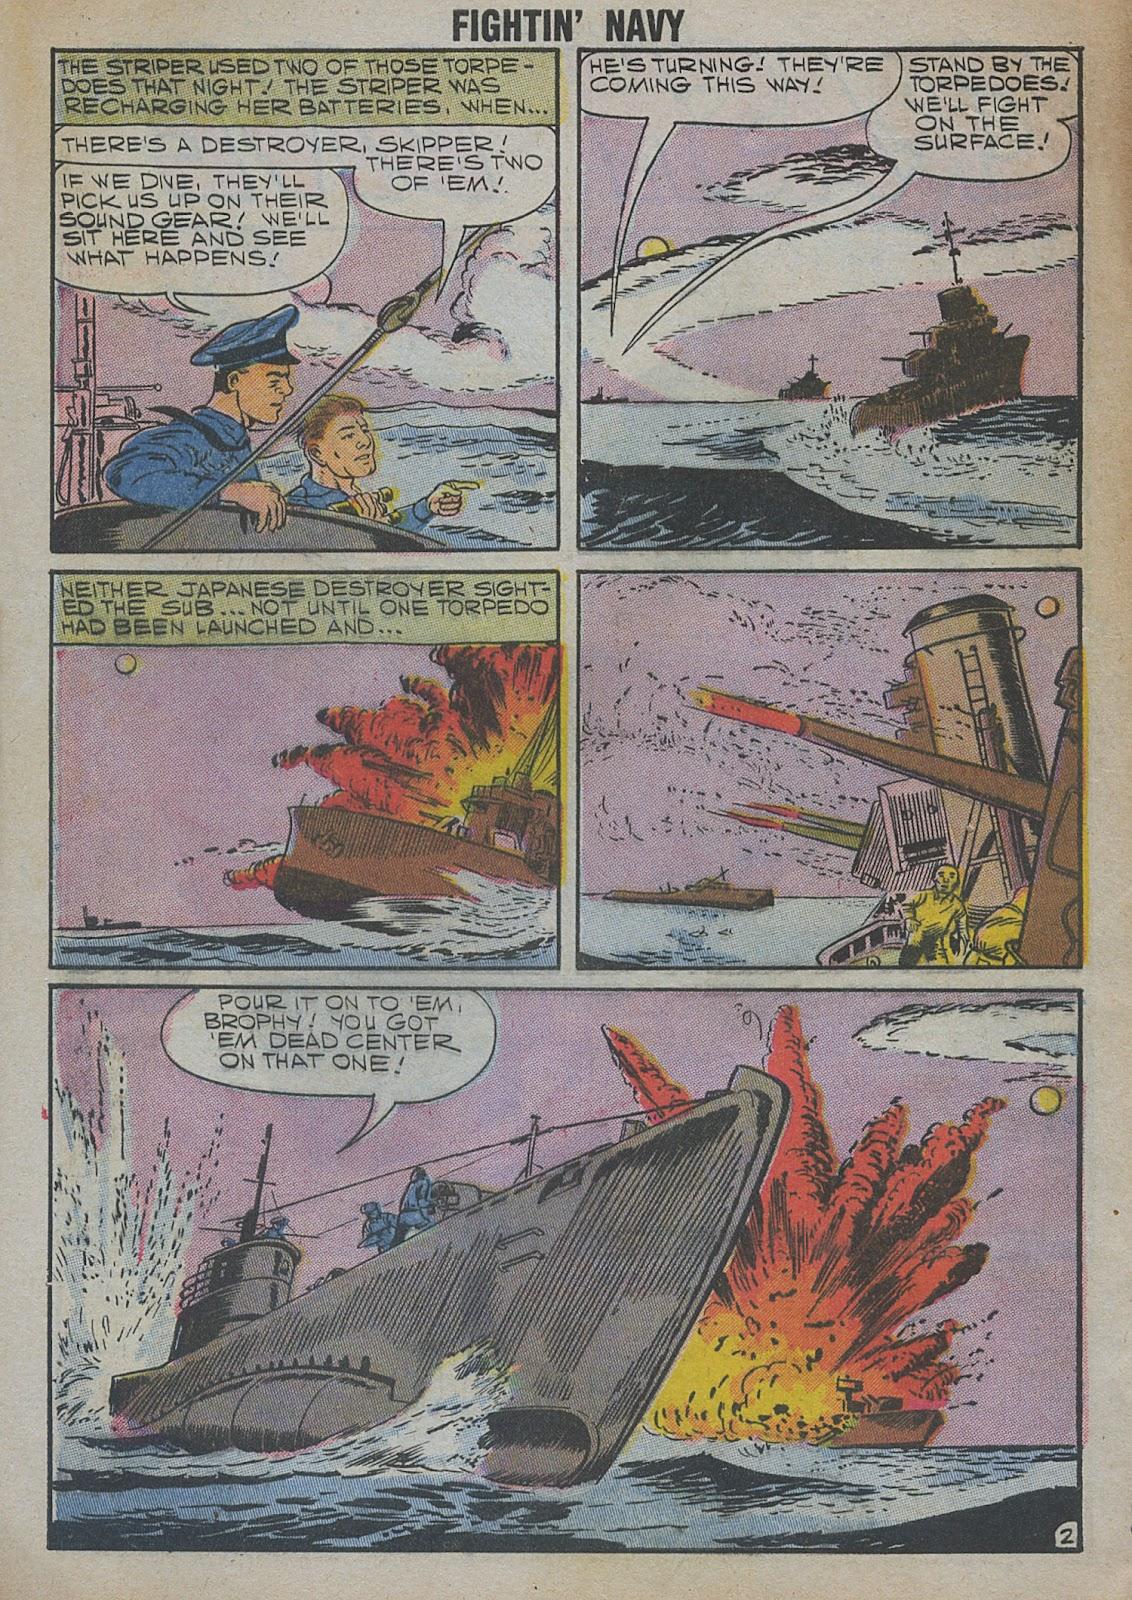 Read online Fightin' Navy comic -  Issue #82 - 4